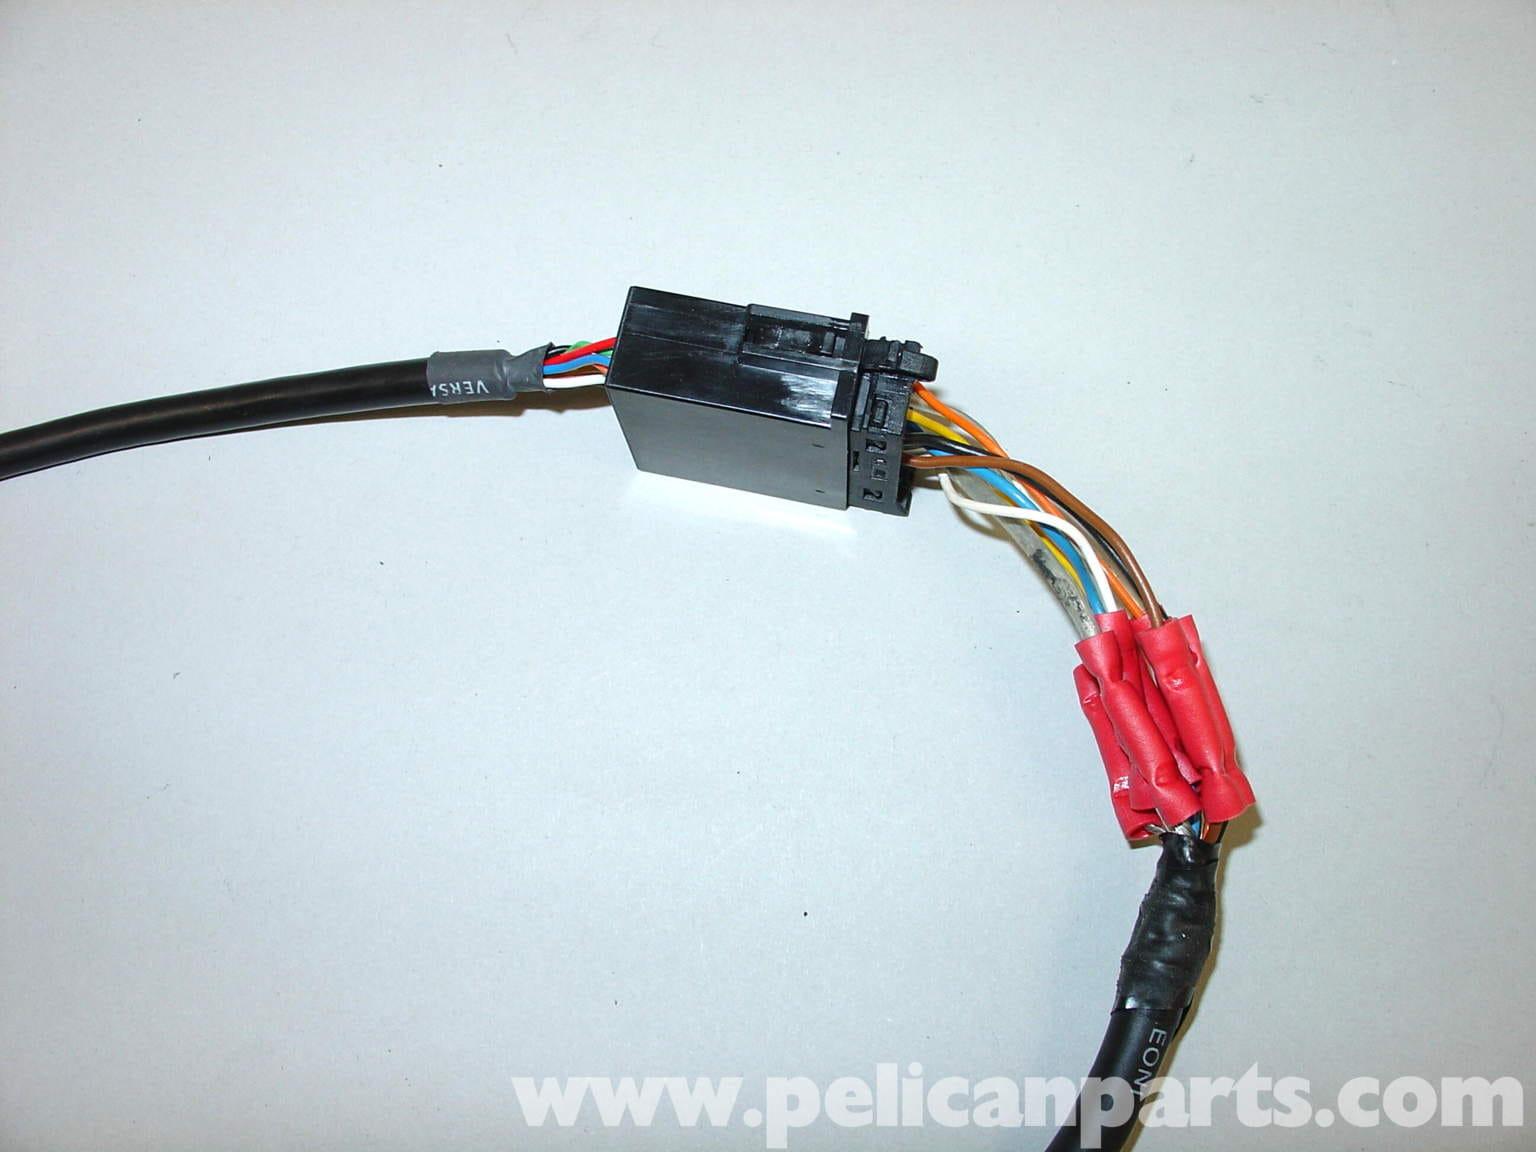 mercedes benz w210 auxiliary ipod input 1996 03 e320 e420 large image